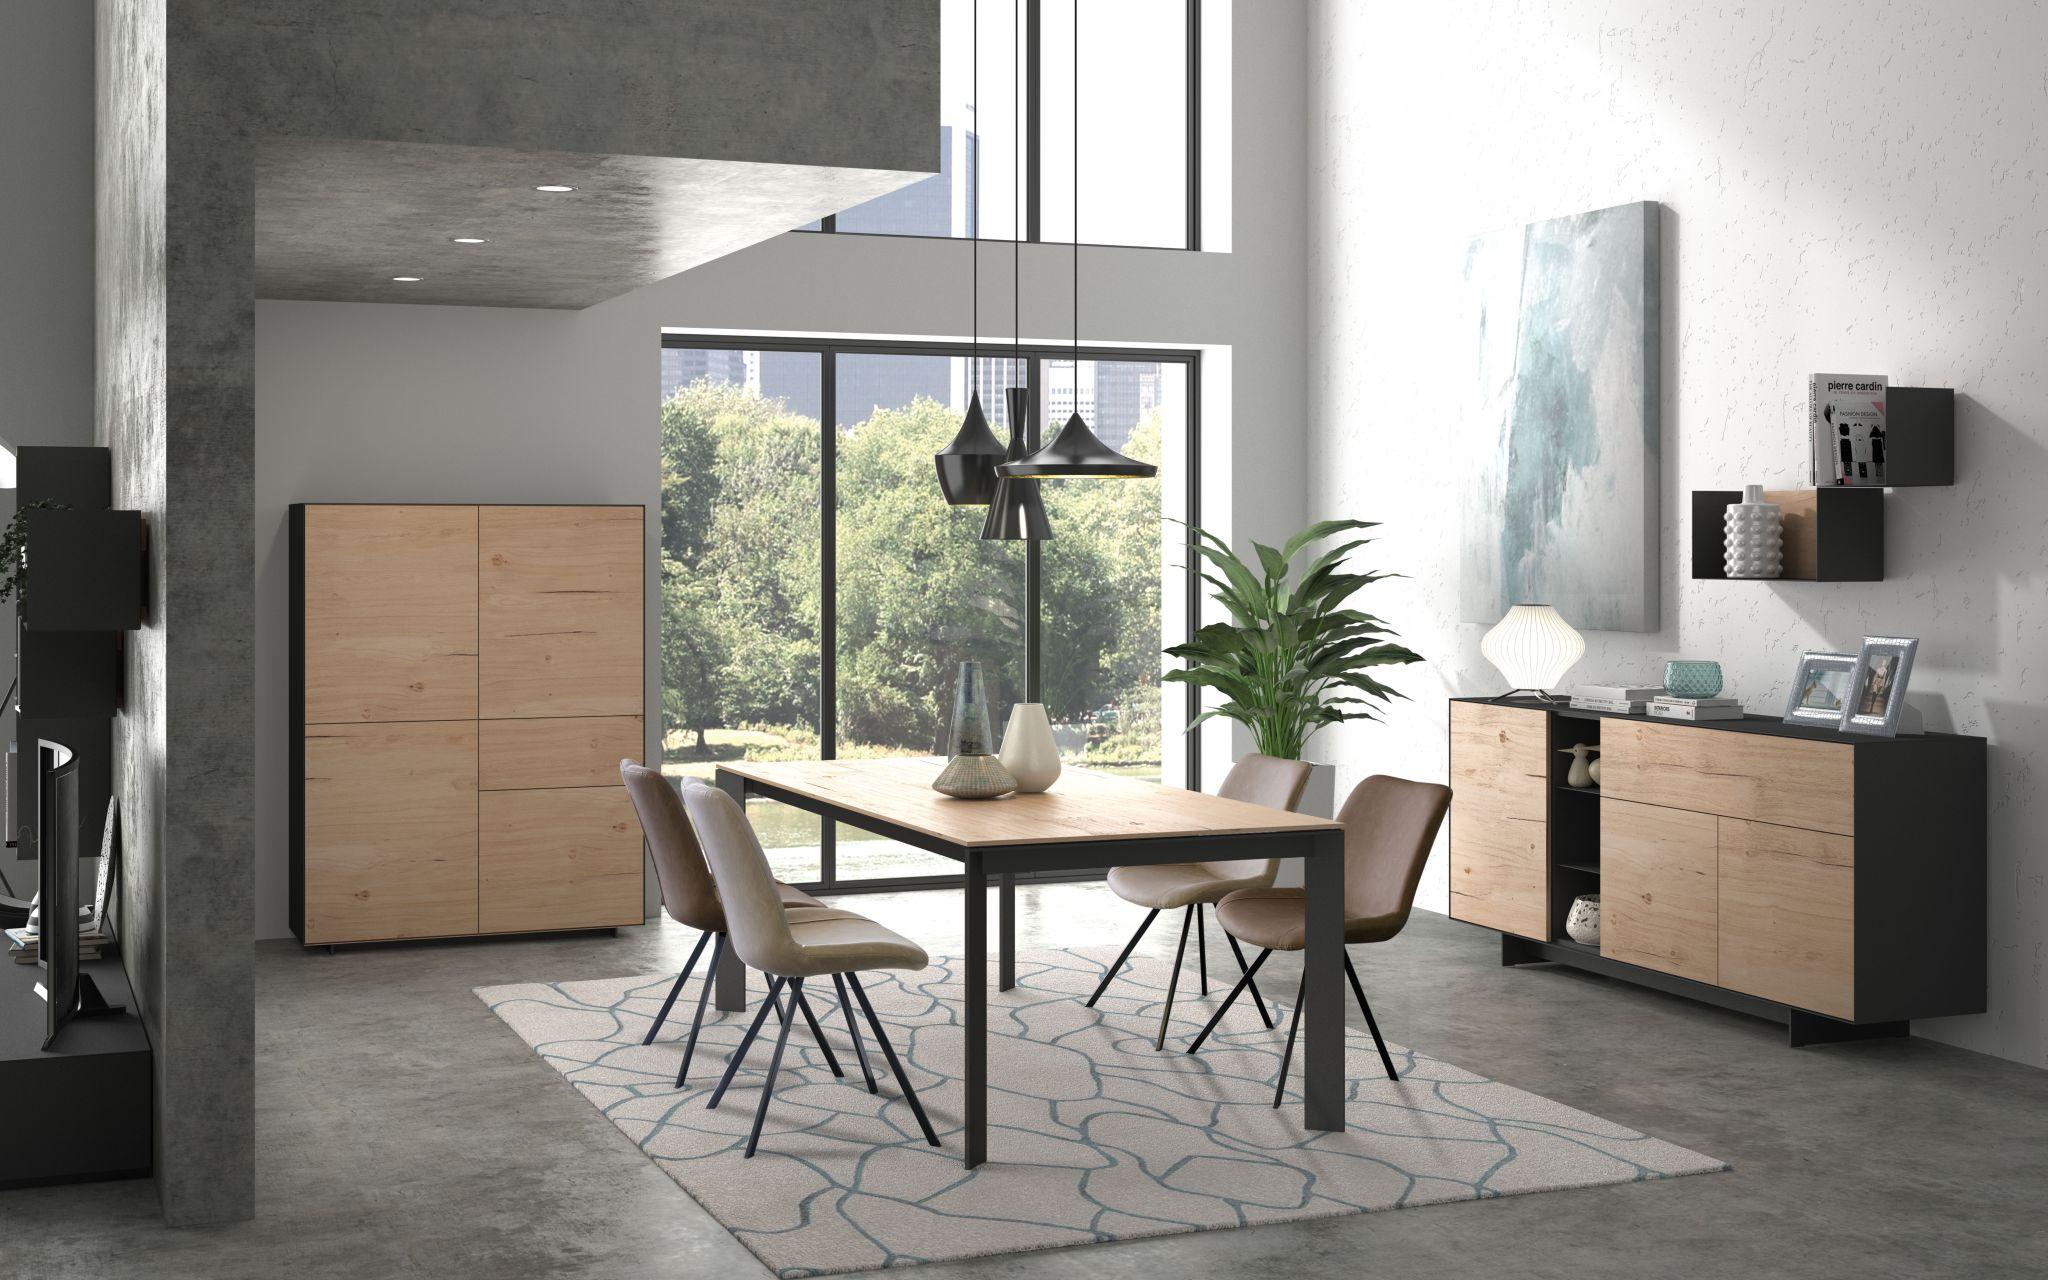 Moderne eetkamer m17br meubelen joremeubelen jore - Moderne eetkamer ...